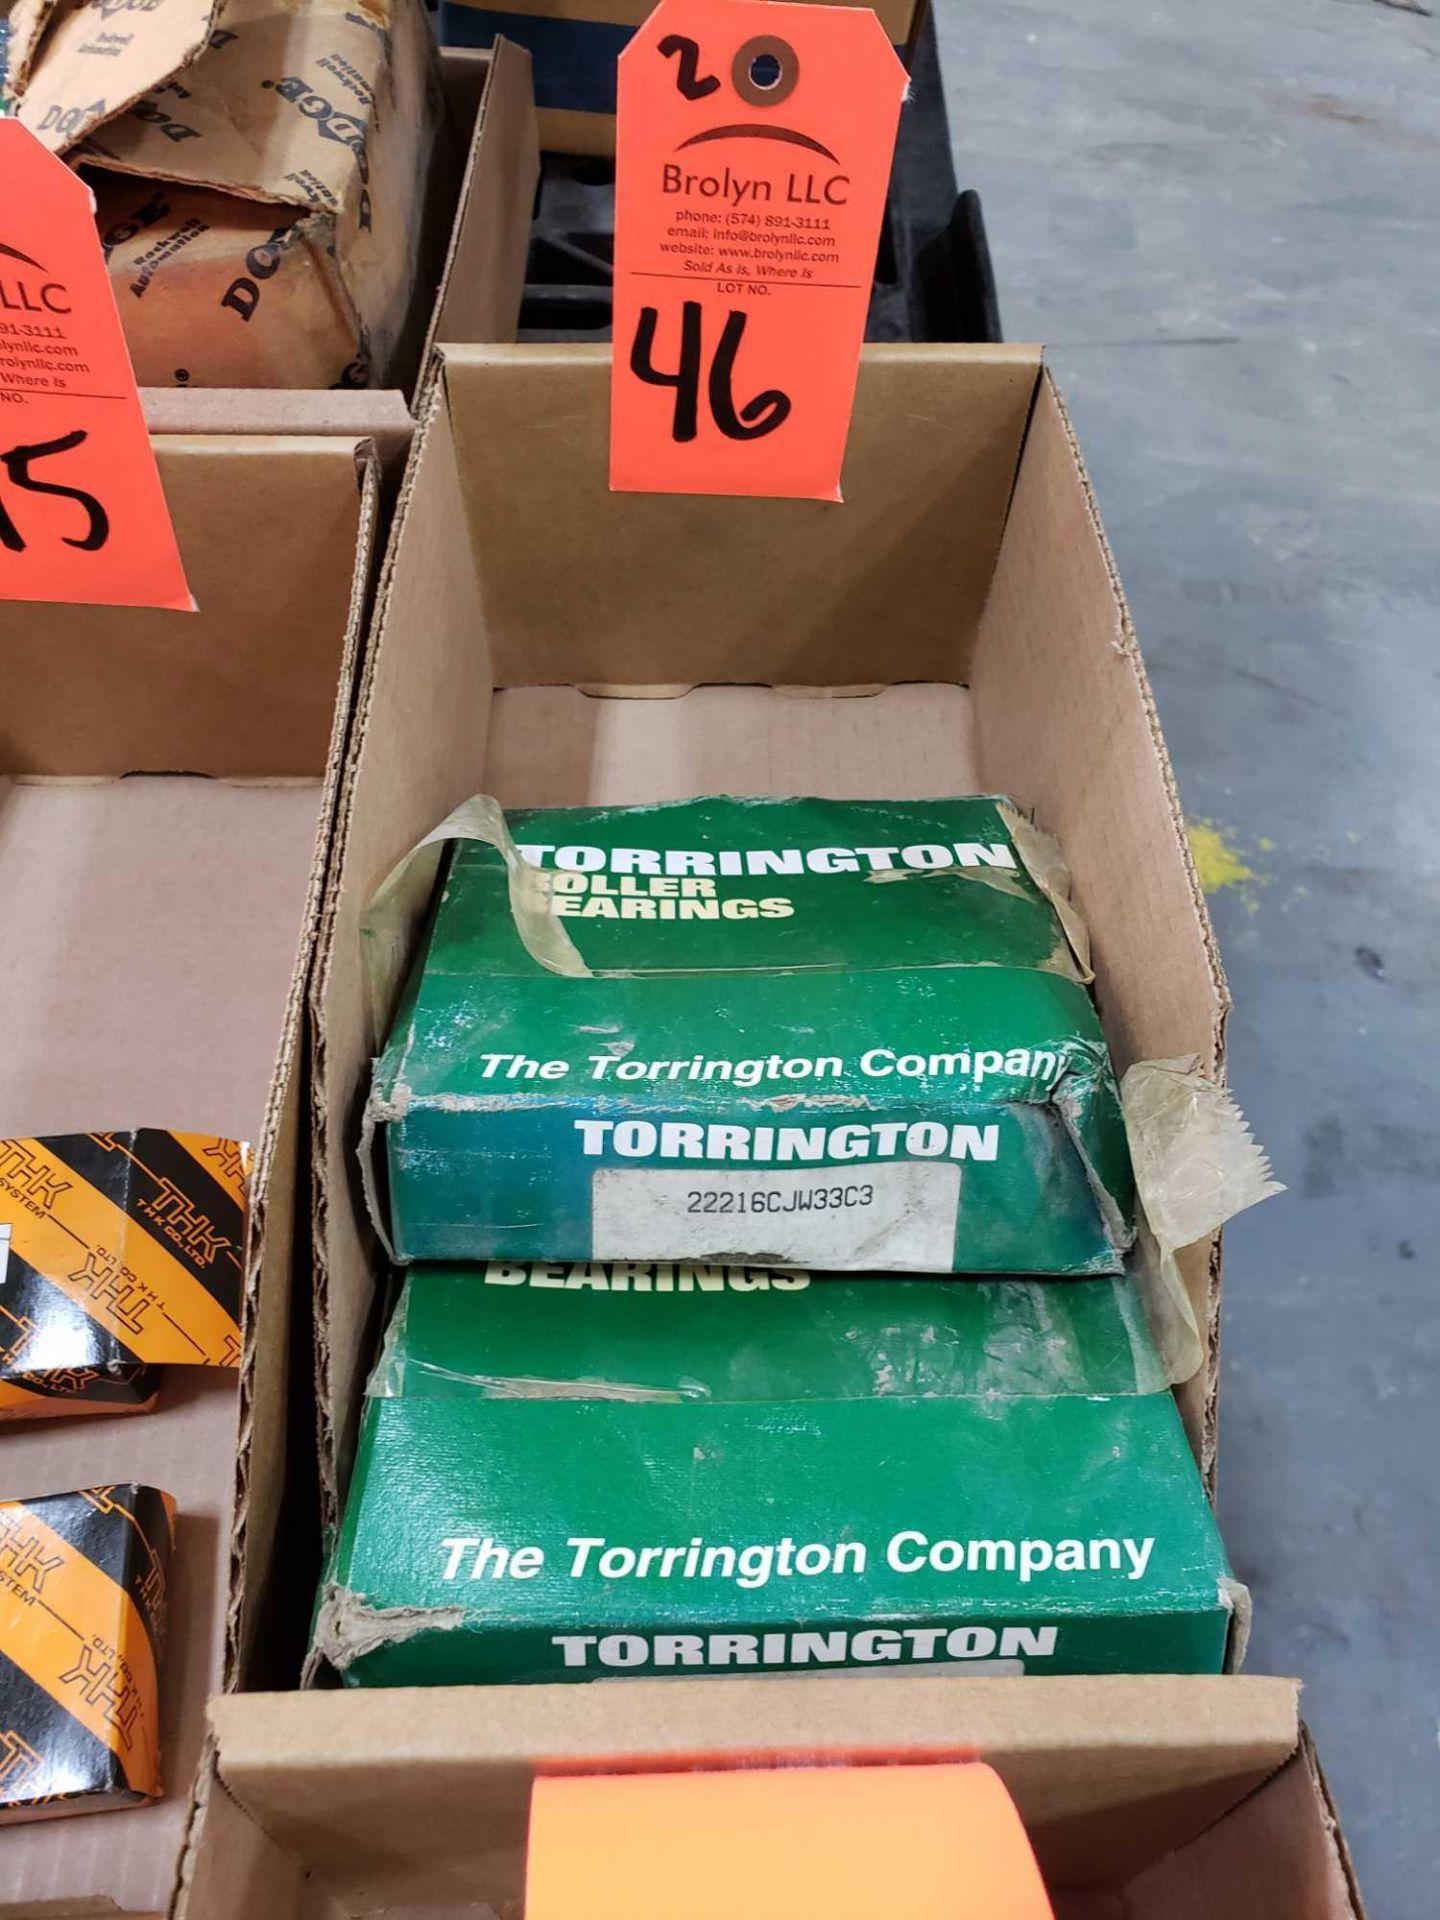 Lot 46 - Qty 2 - Torrington Bearings model 22216CJW33C3. New in boxes.